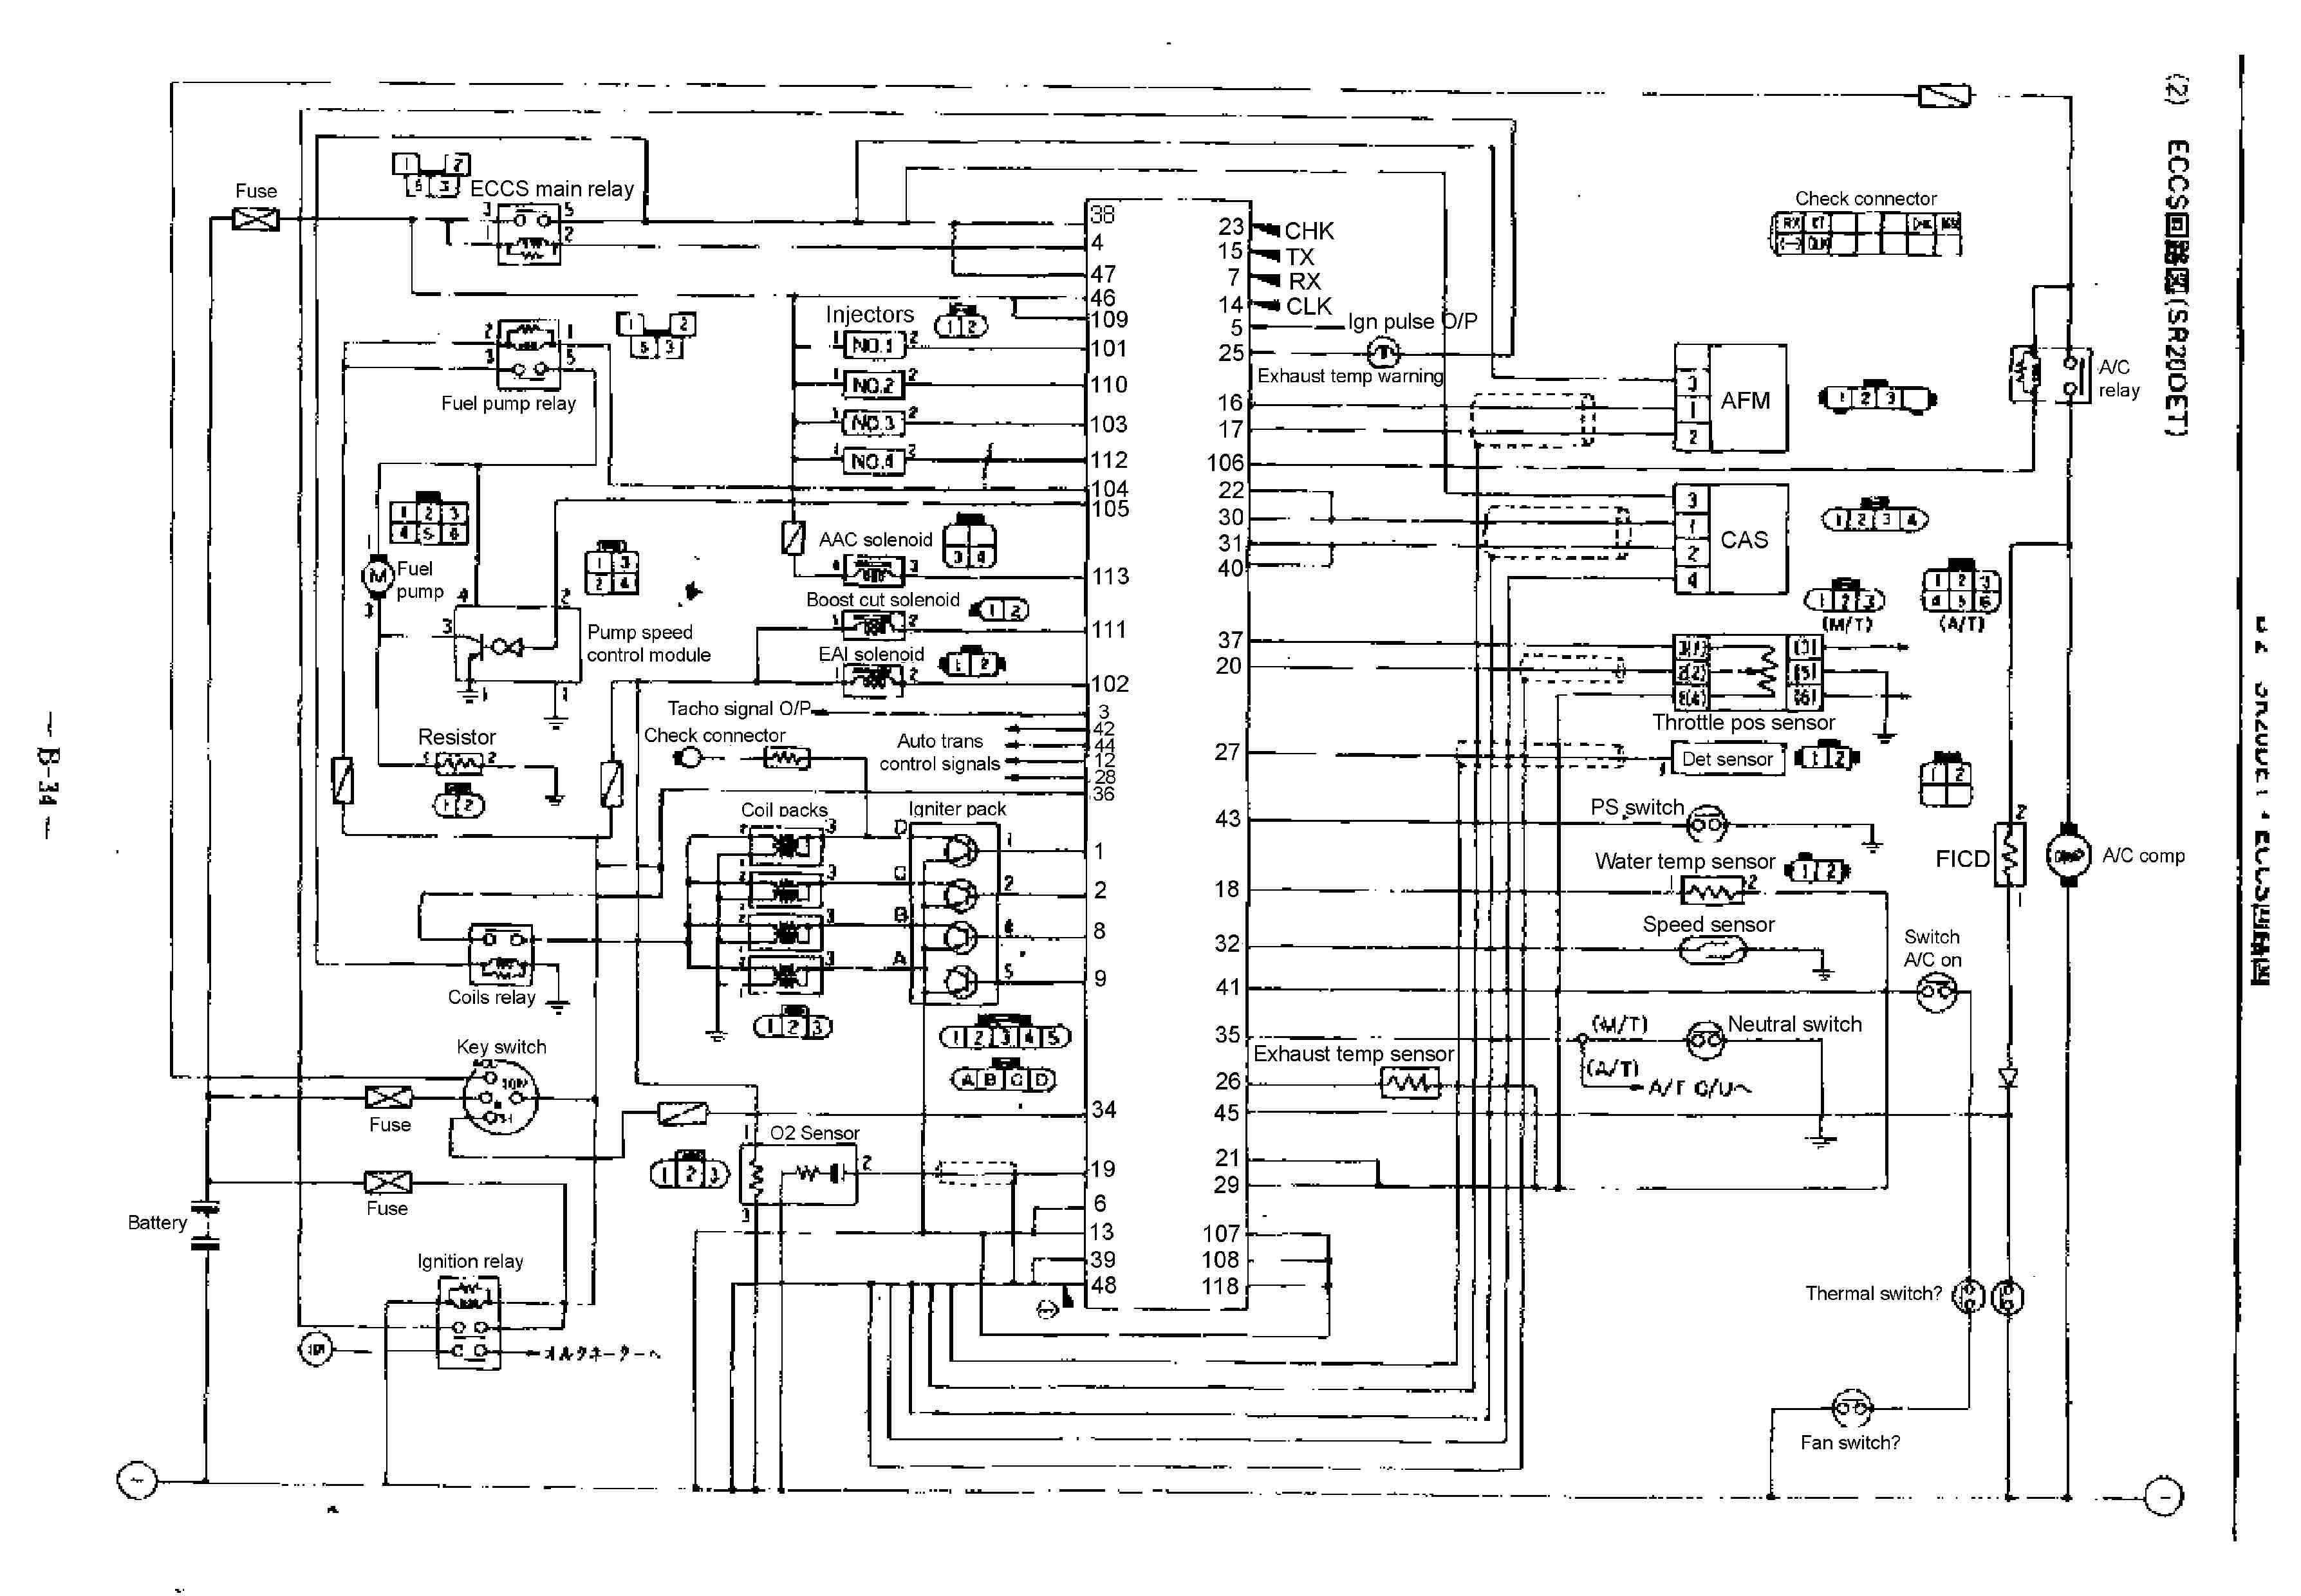 bluebird bus wiring diagram 1994 completed wiring diagrams u2022 rh vojvodinaslovakart com